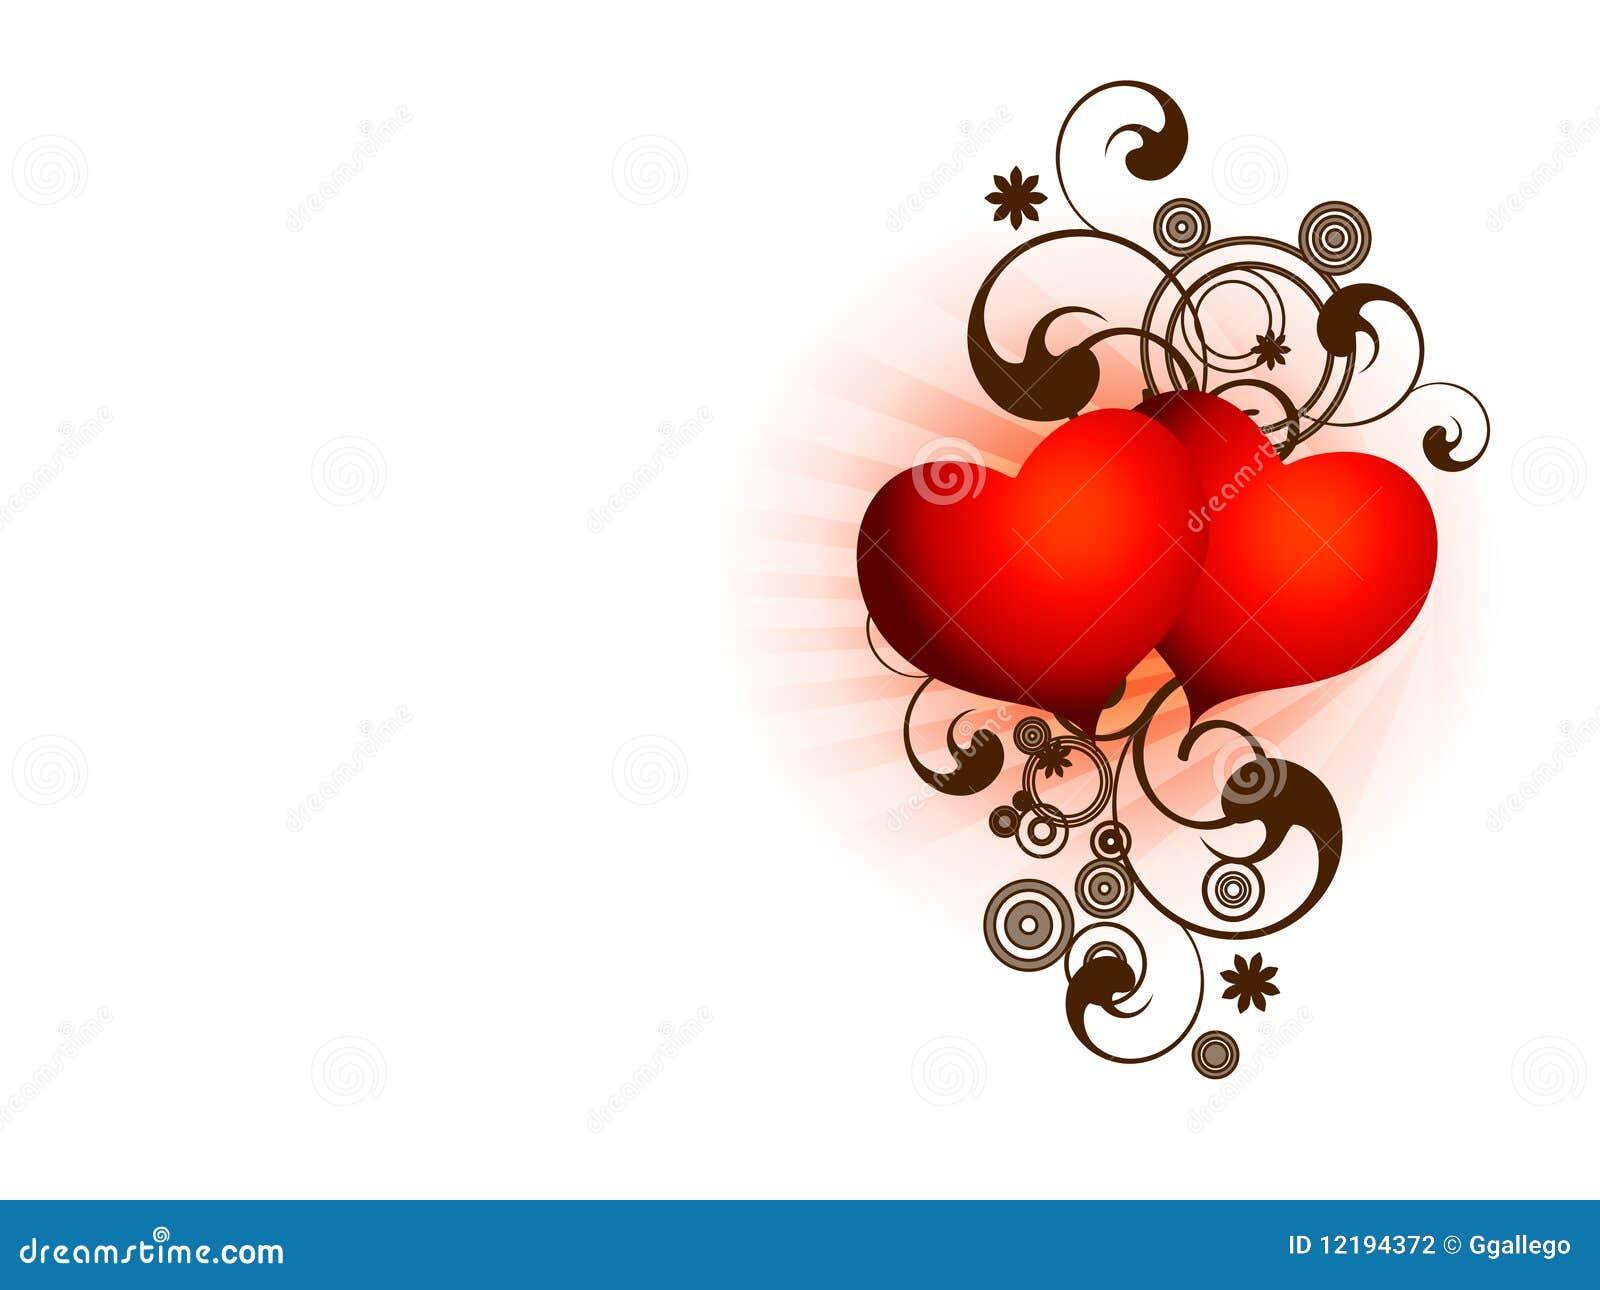 San Valentine Two Hearts